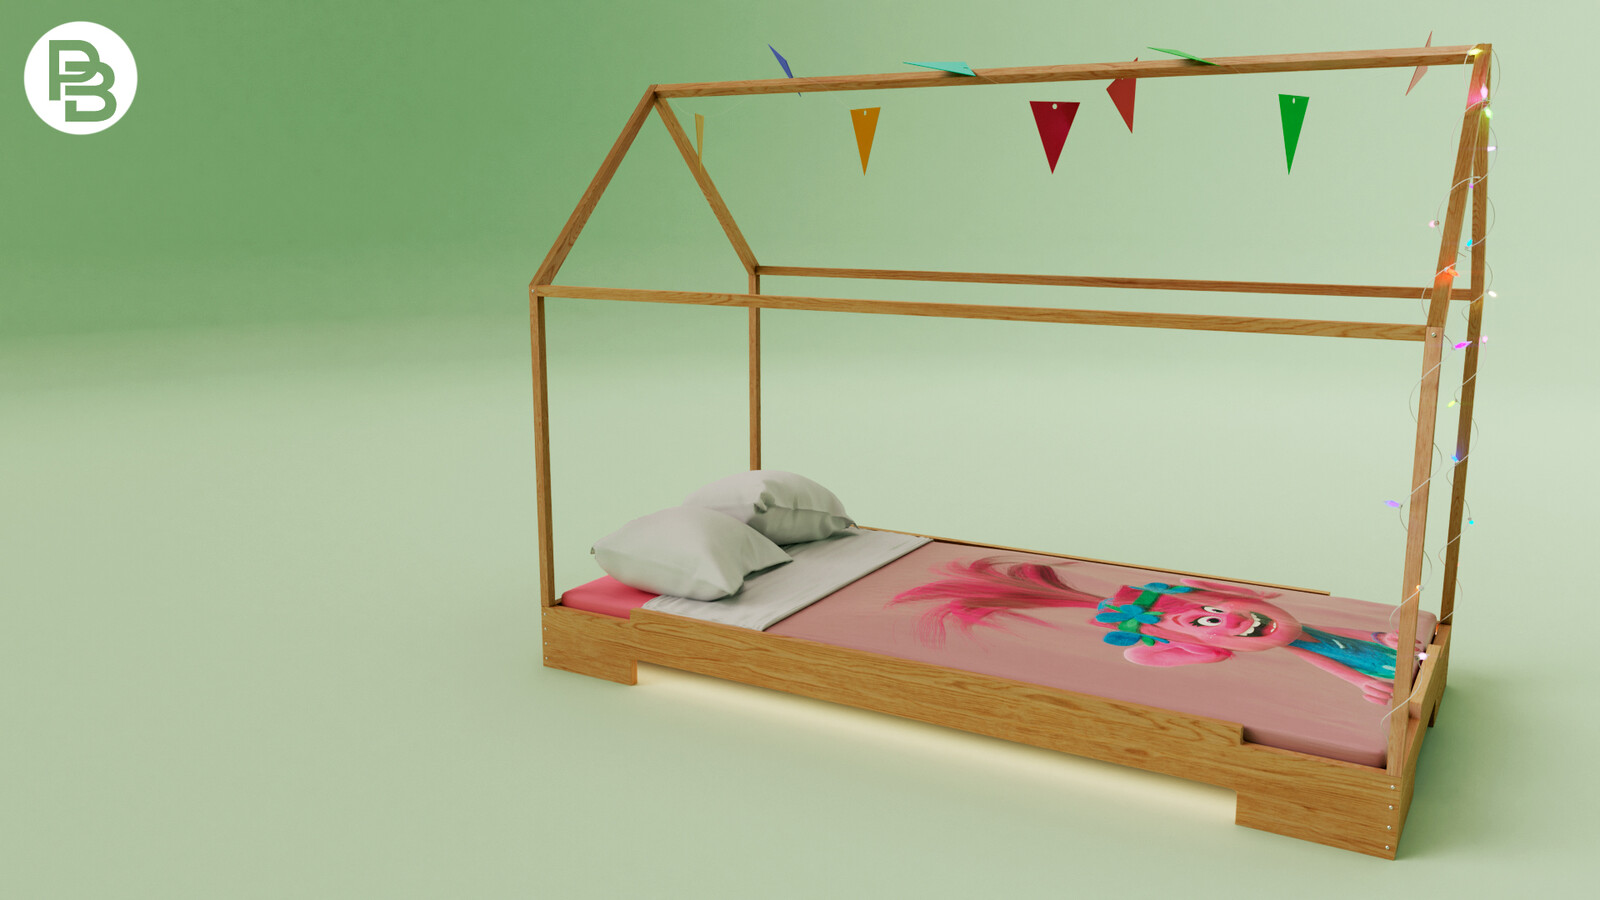 Trolls bed